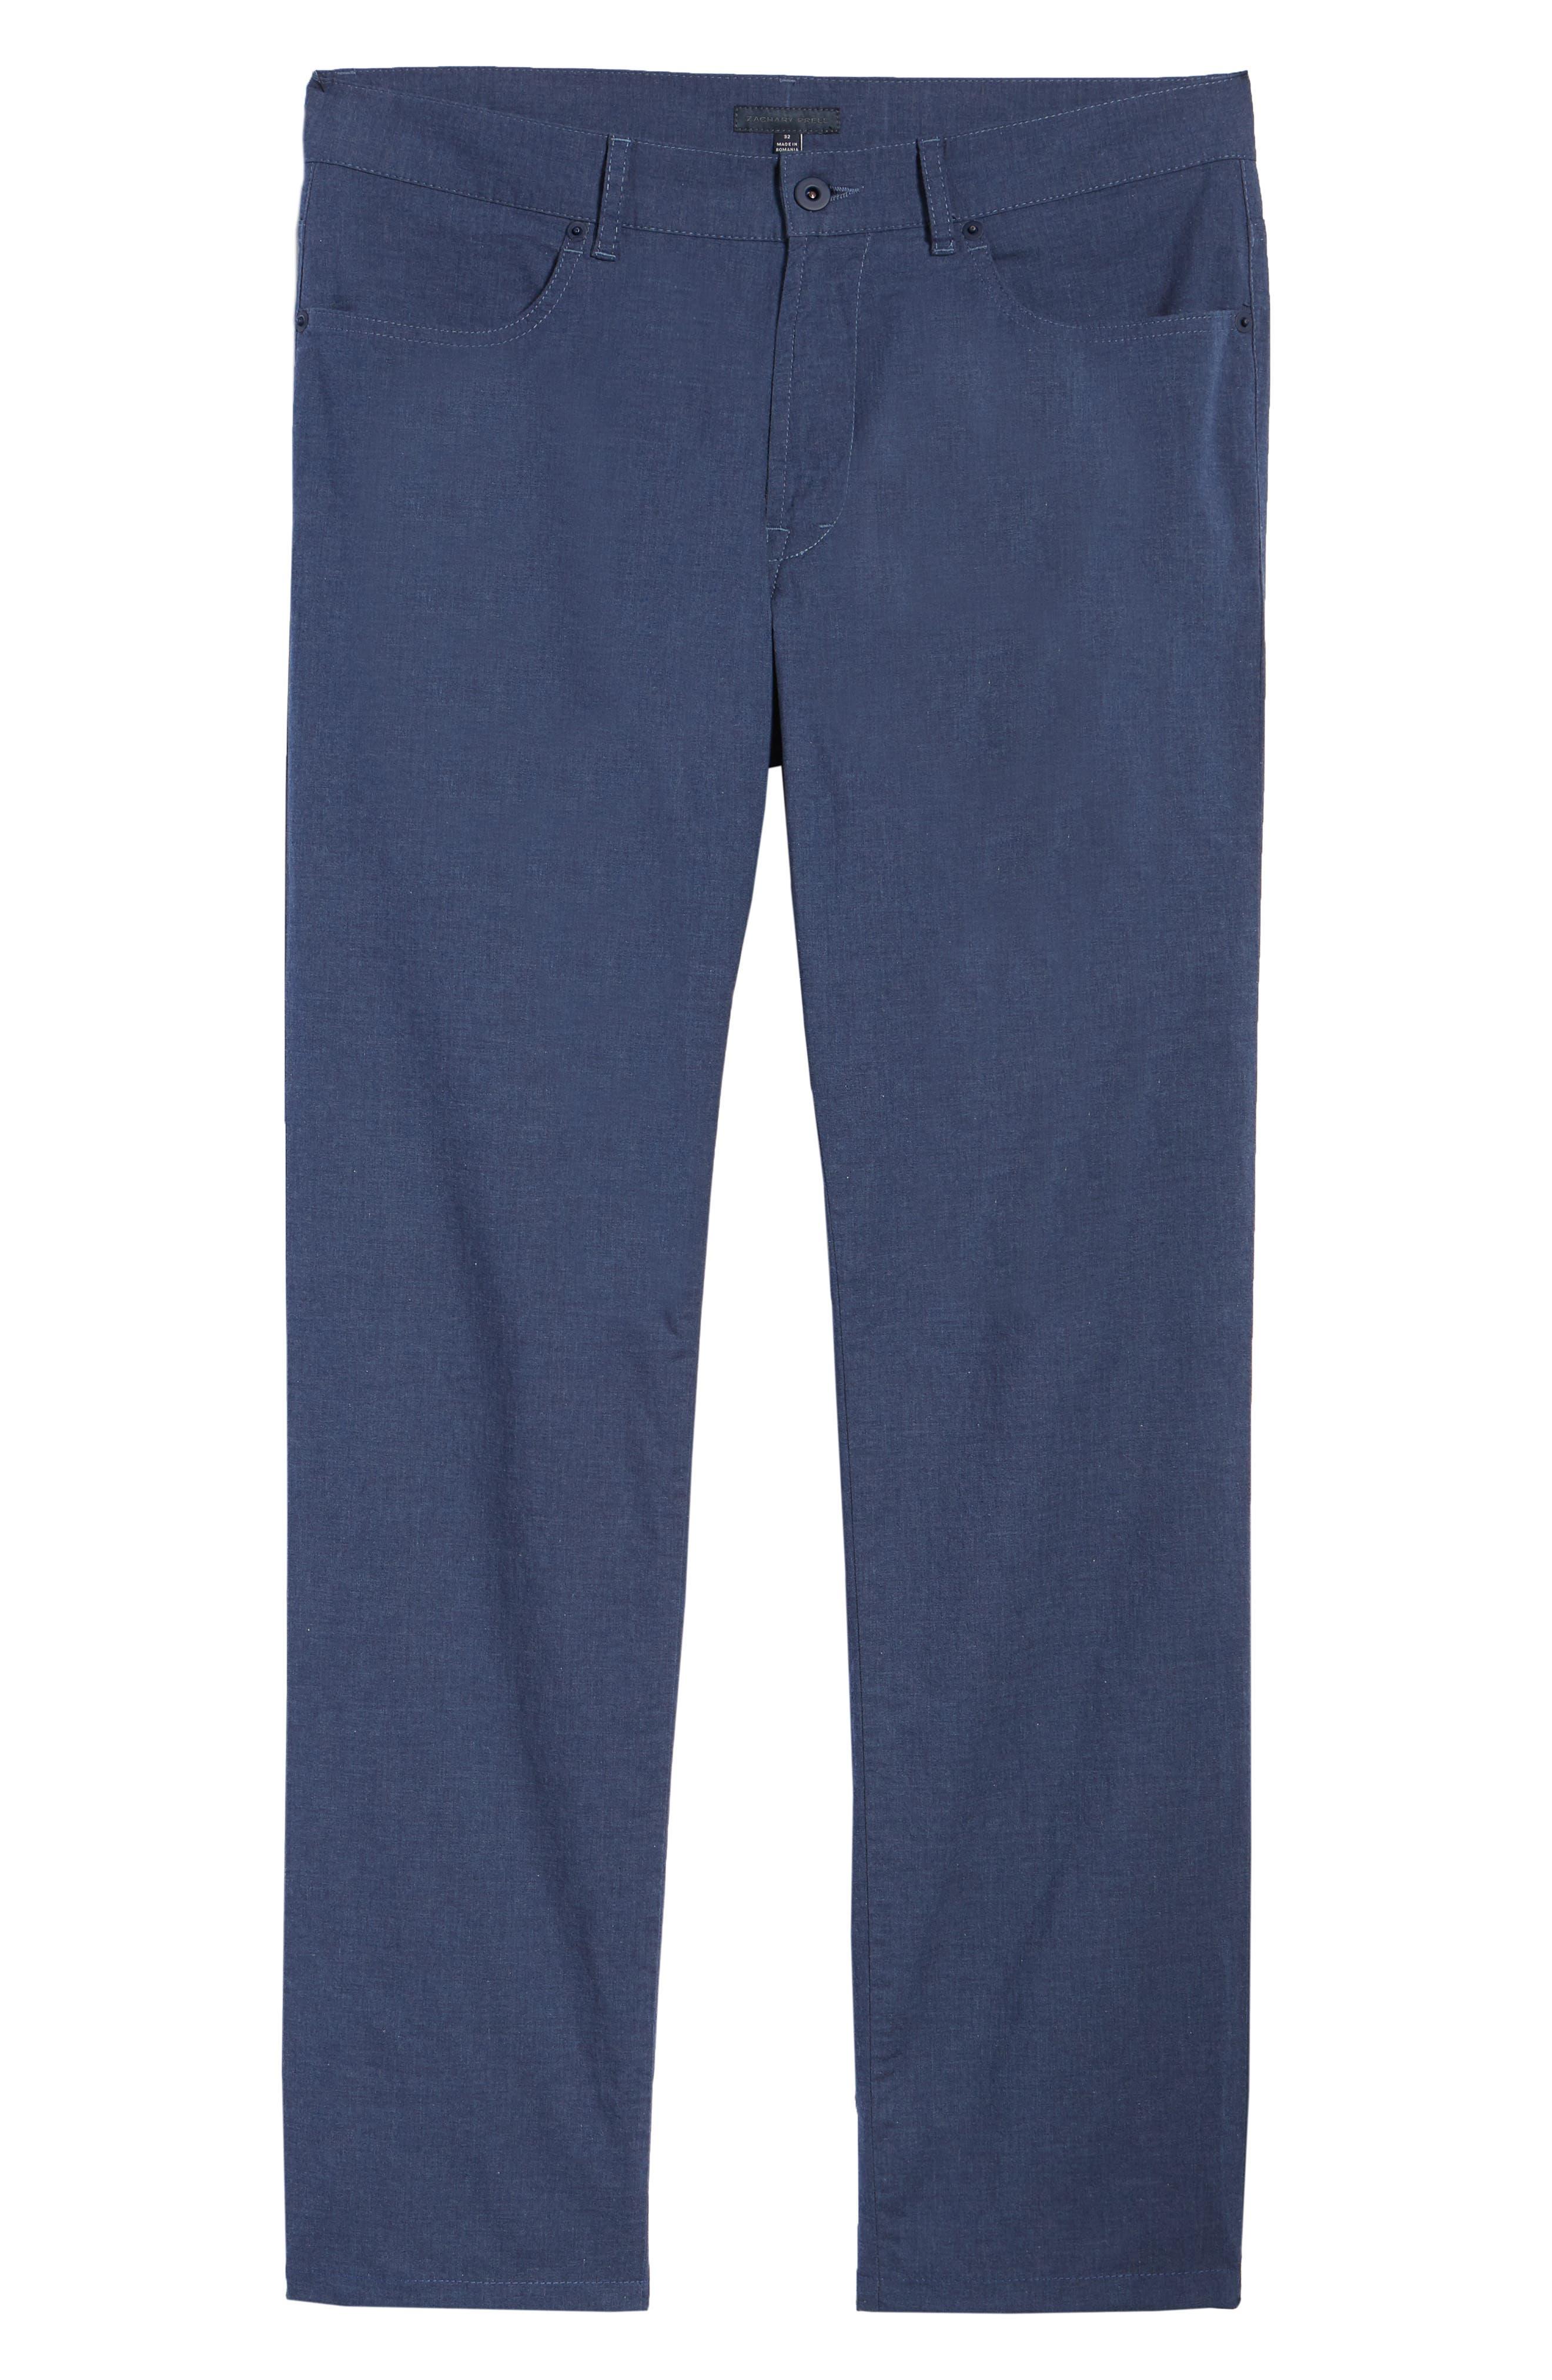 McKinney Regular Fit Straight Leg Pants,                             Alternate thumbnail 6, color,                             Blue